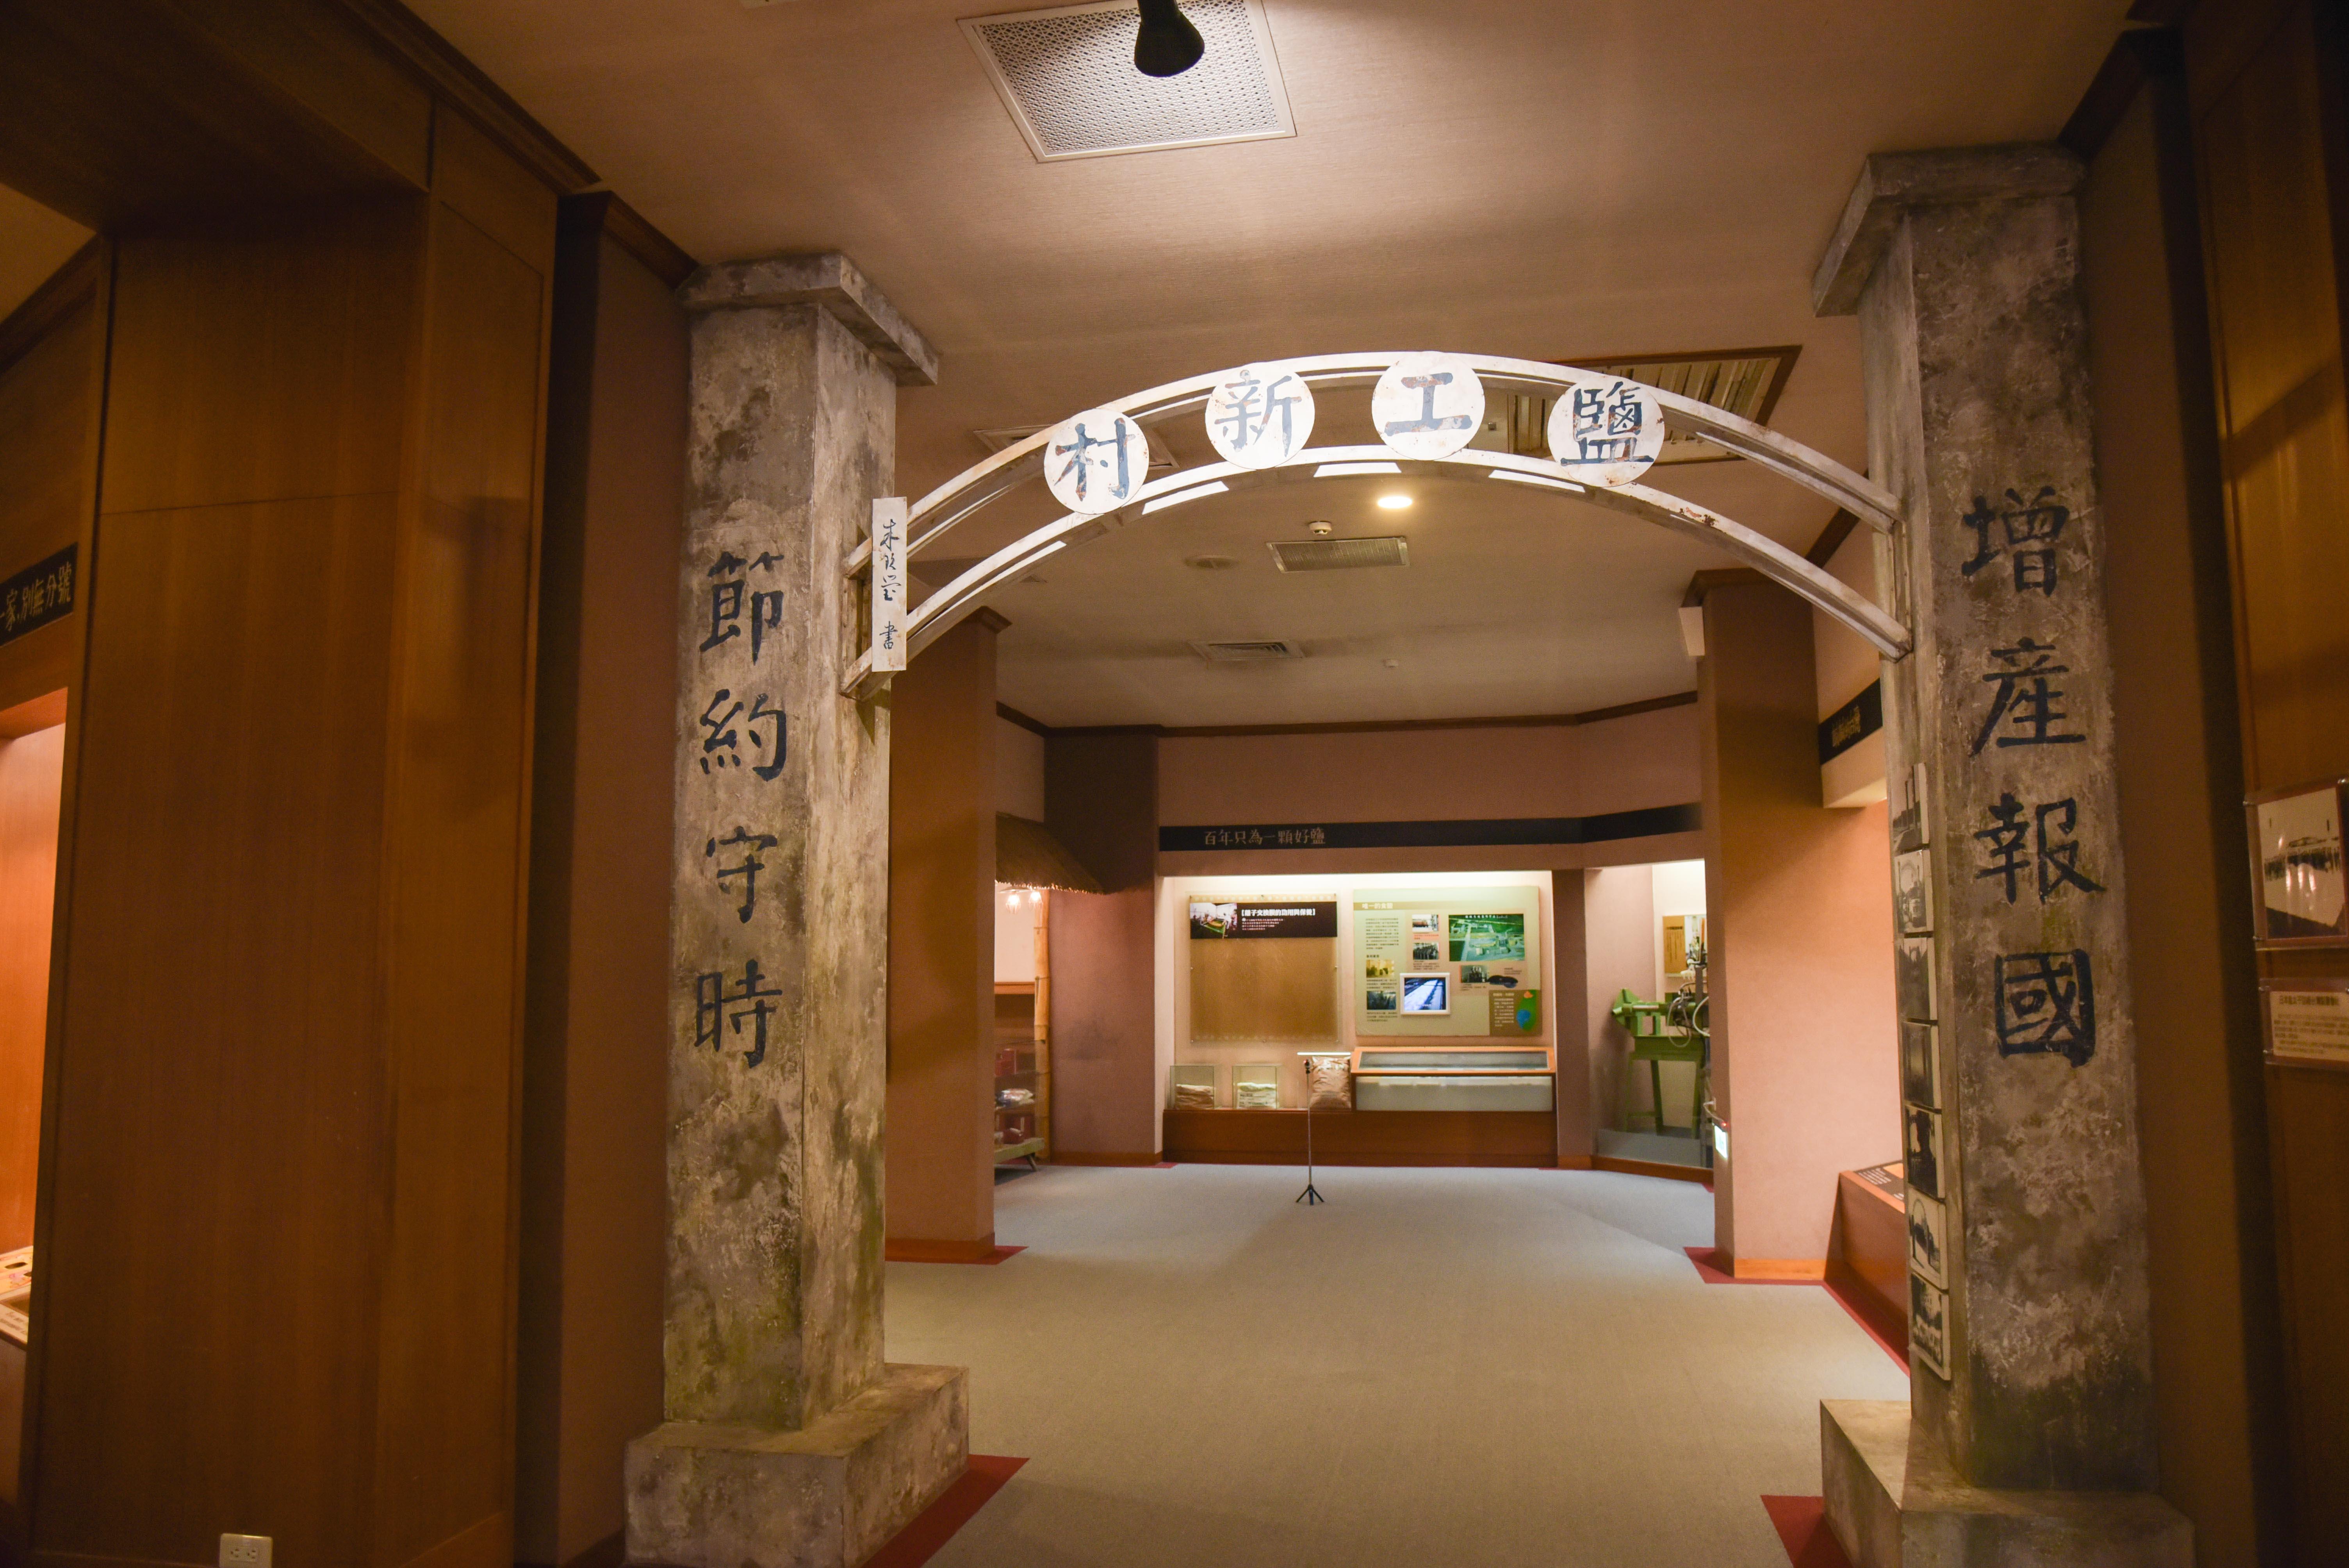 台灣鹽博物館の塩工新村